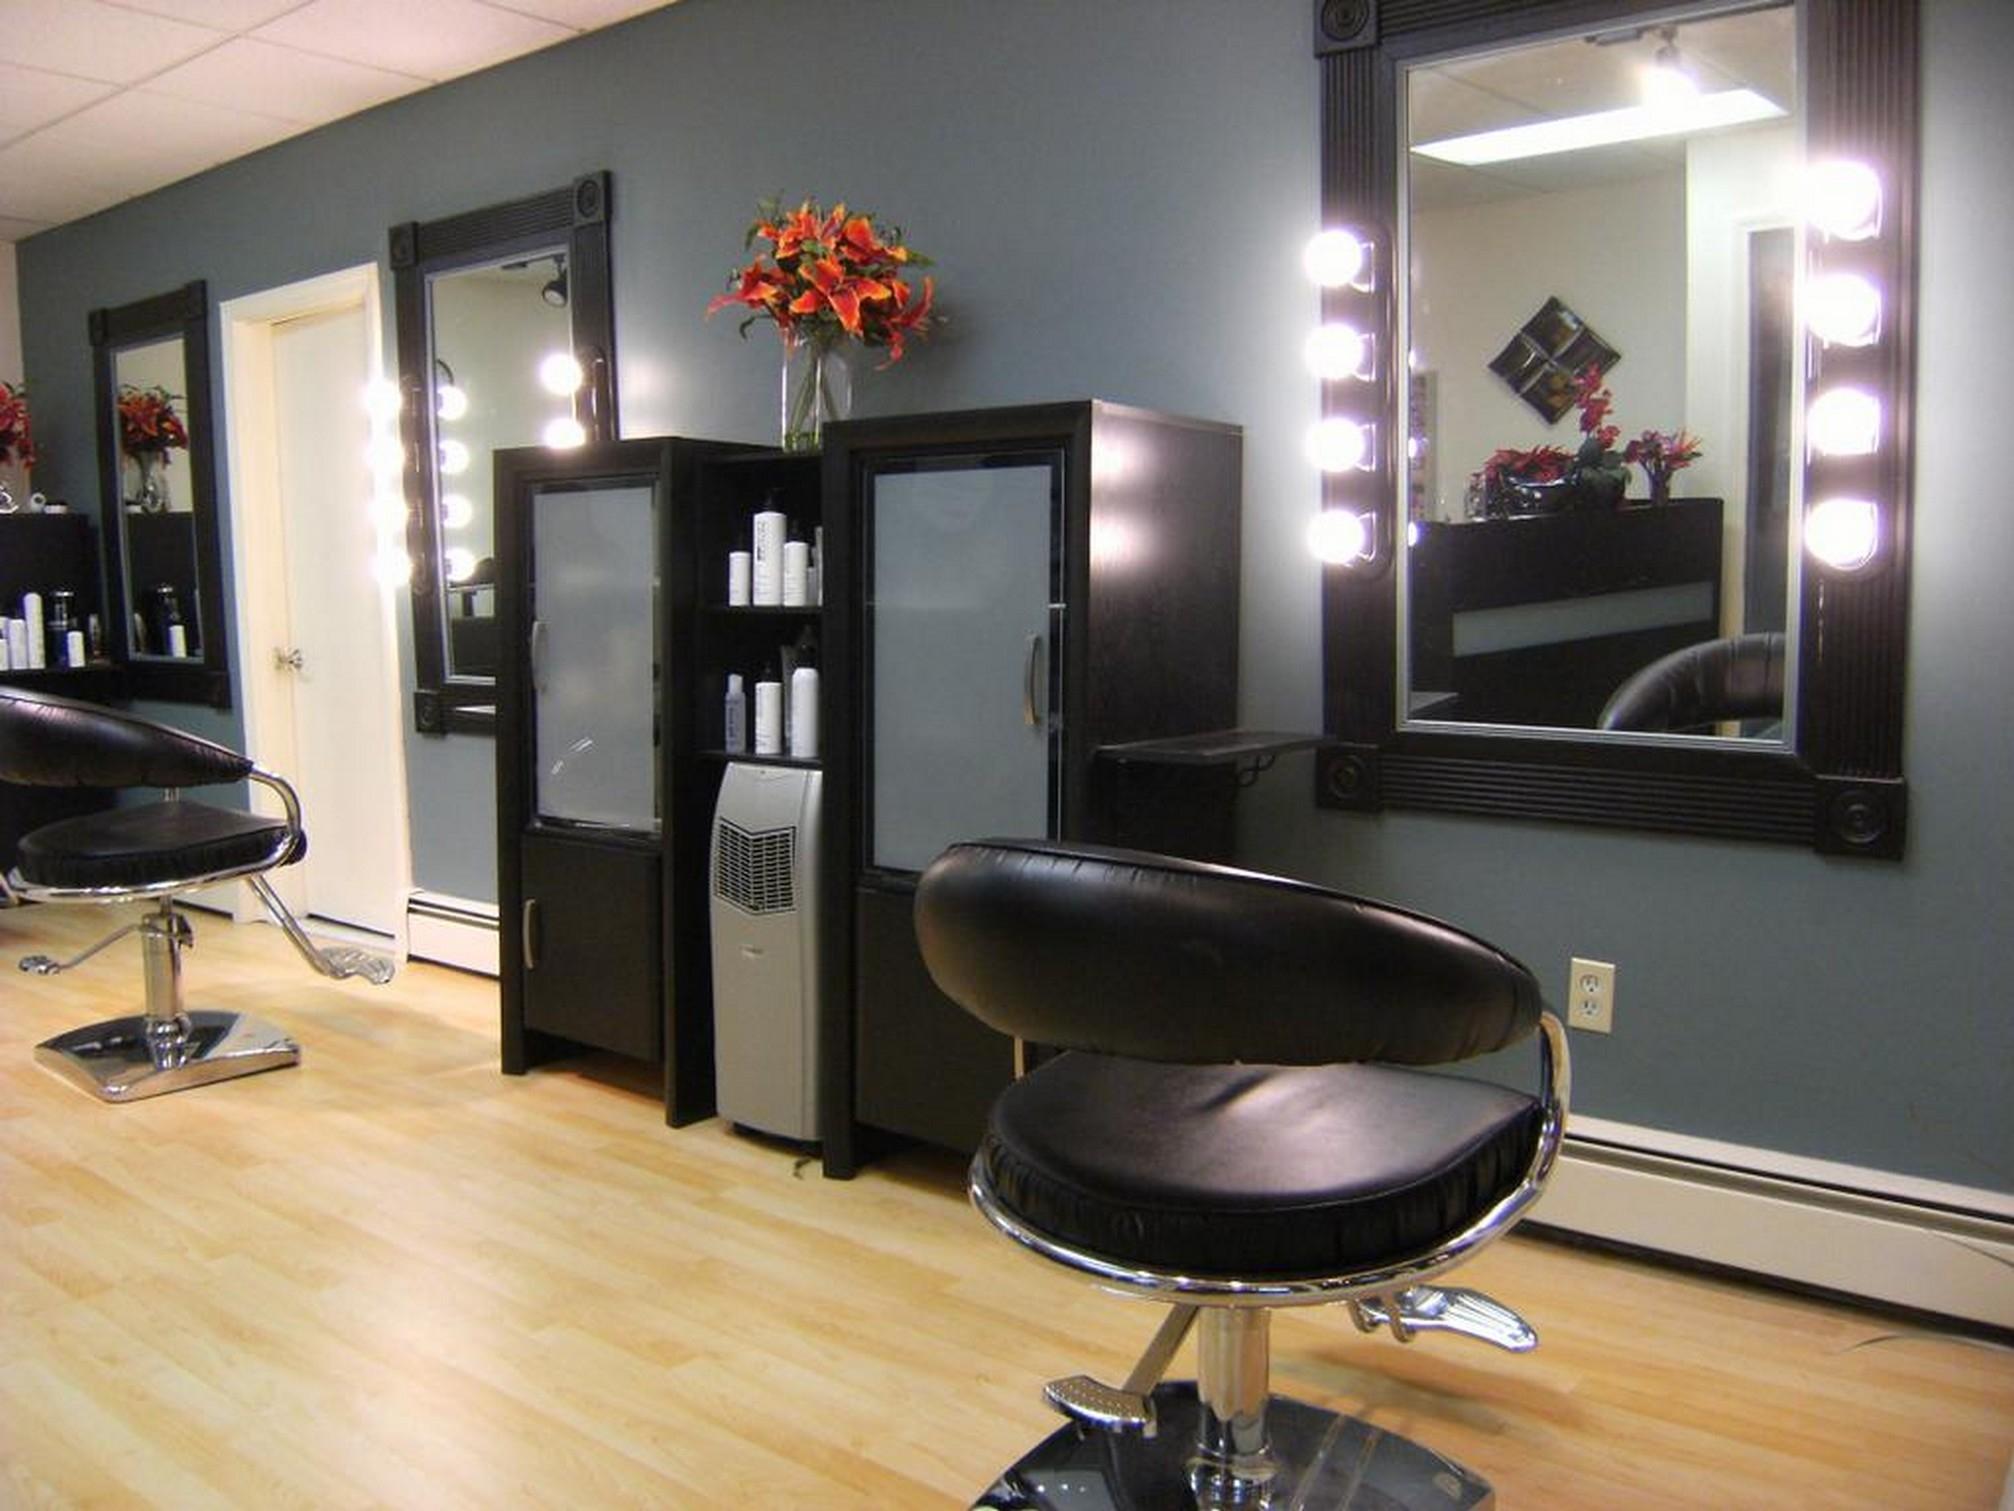 Mirrors On The Wall Hair Salon